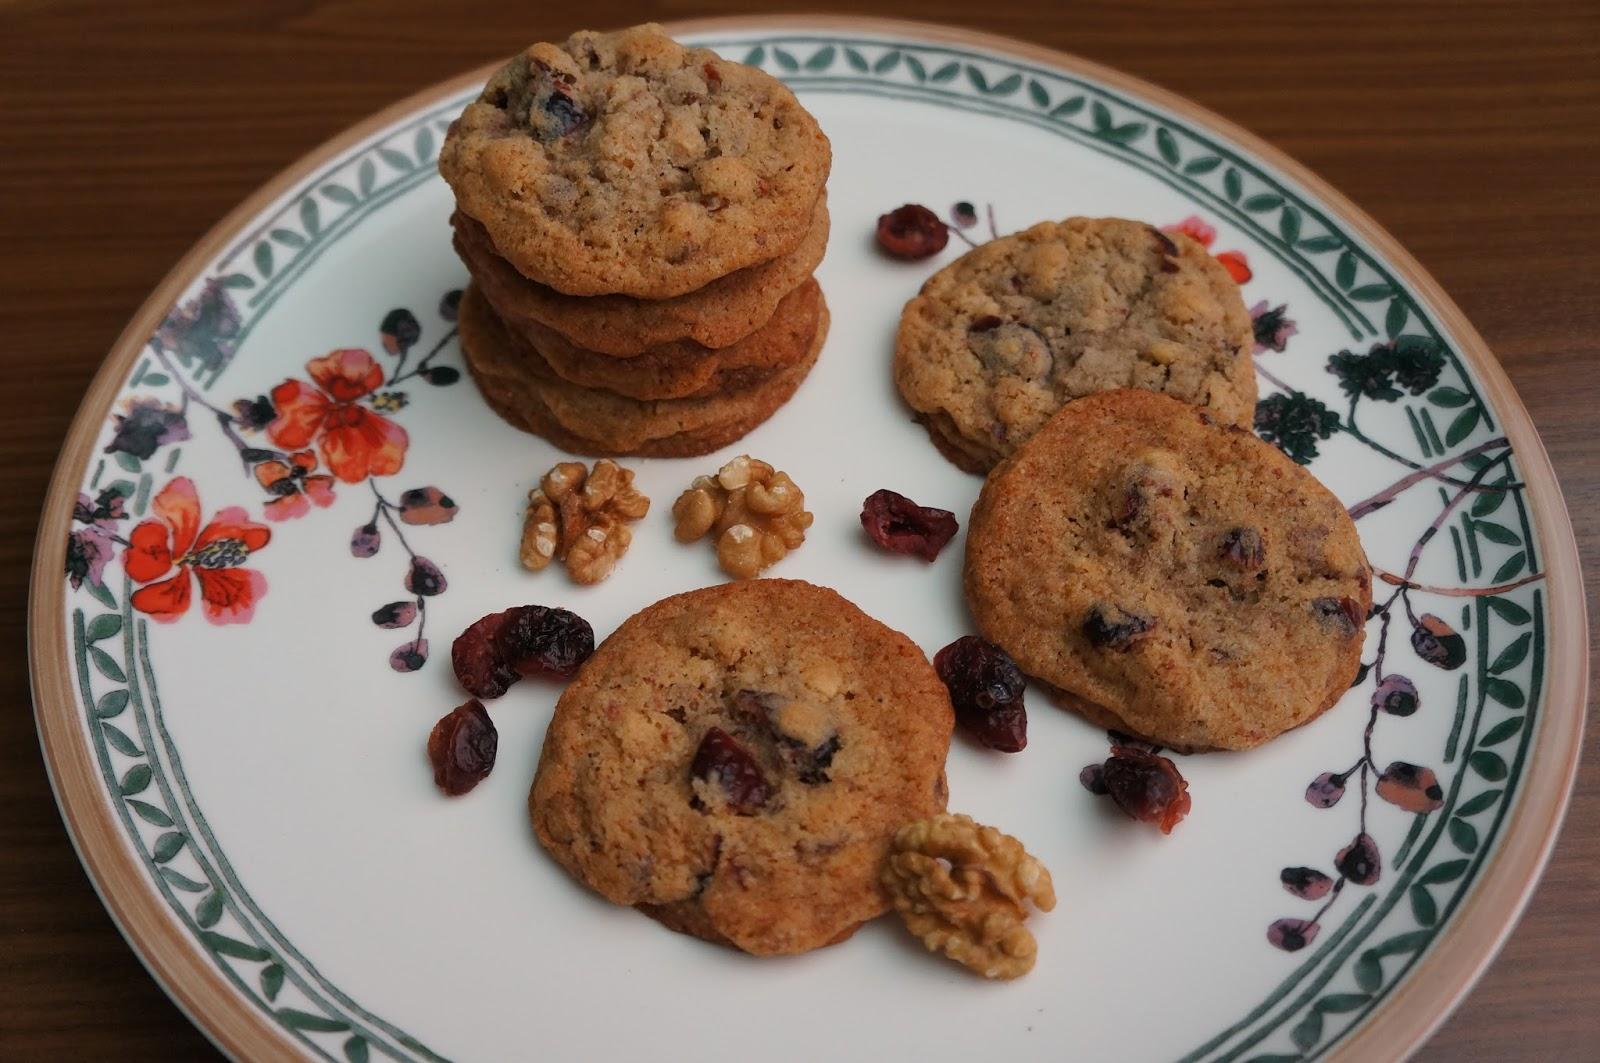 du findest mich in der k che walnuss cranberry cookies. Black Bedroom Furniture Sets. Home Design Ideas